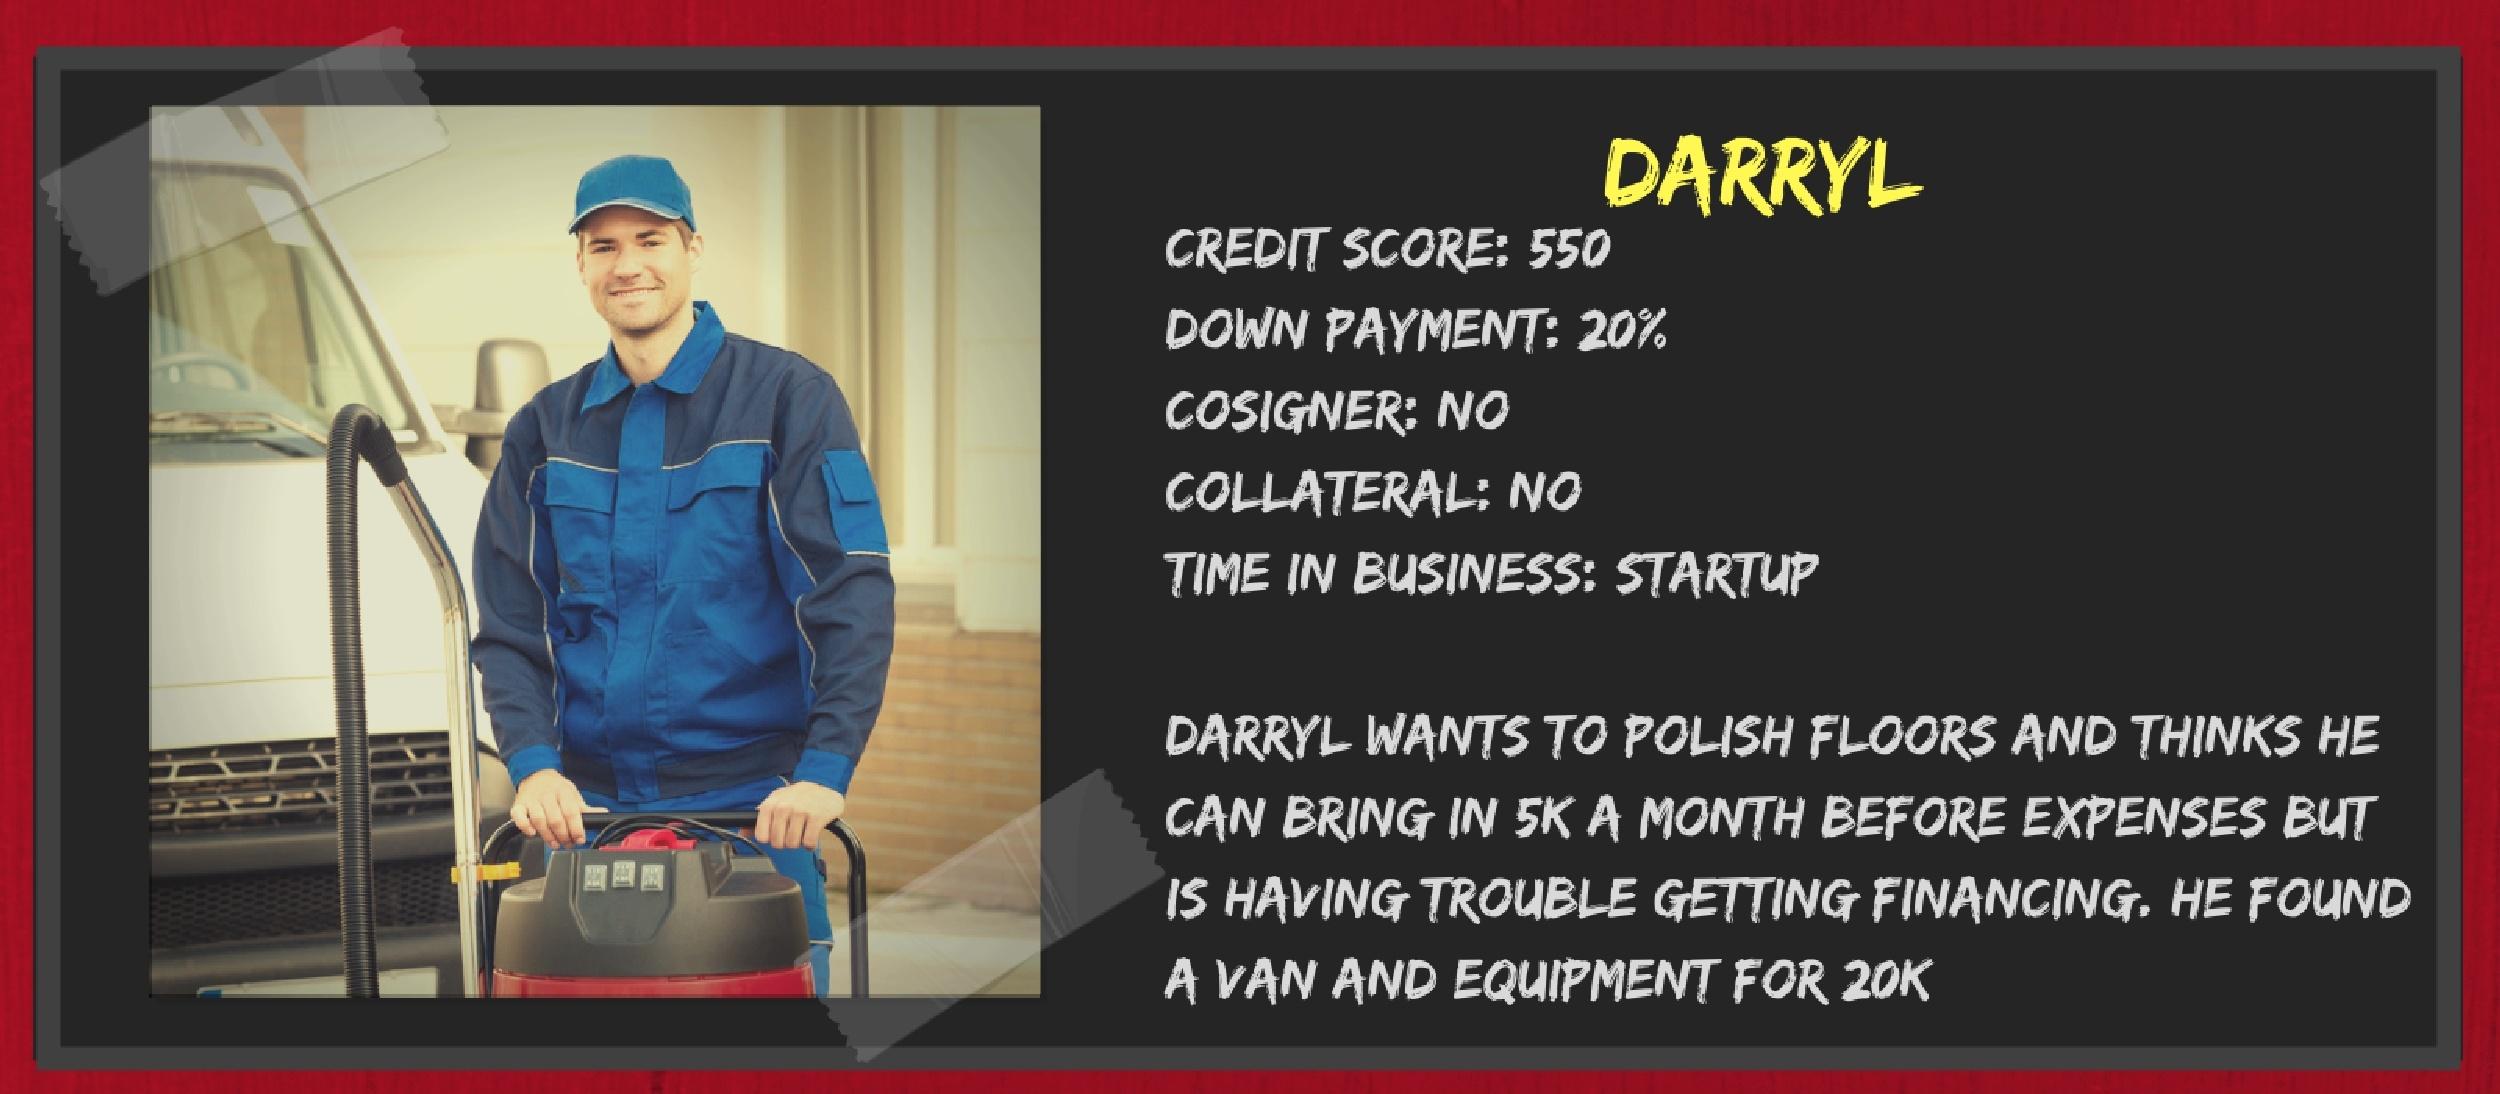 lease-janitorial-equipment-550 credit.jpg